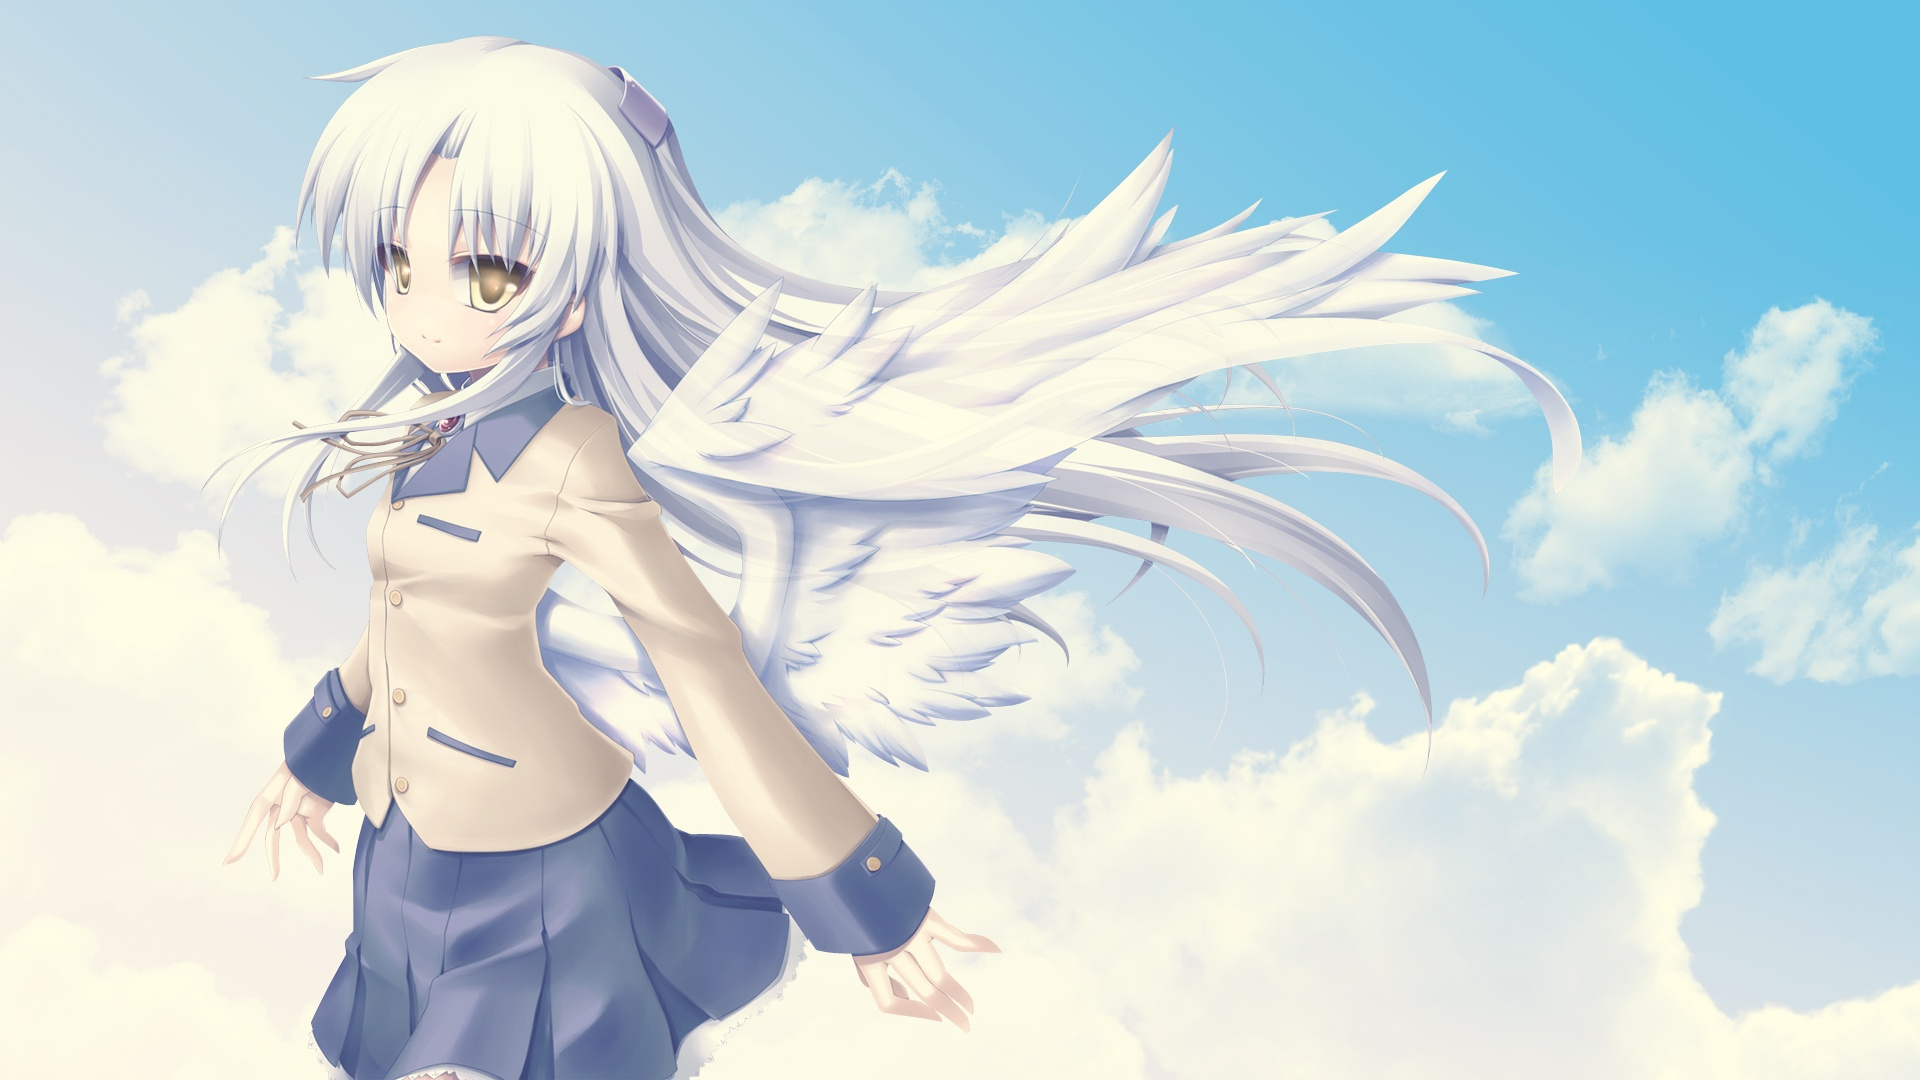 Anime Character cool wallpaper